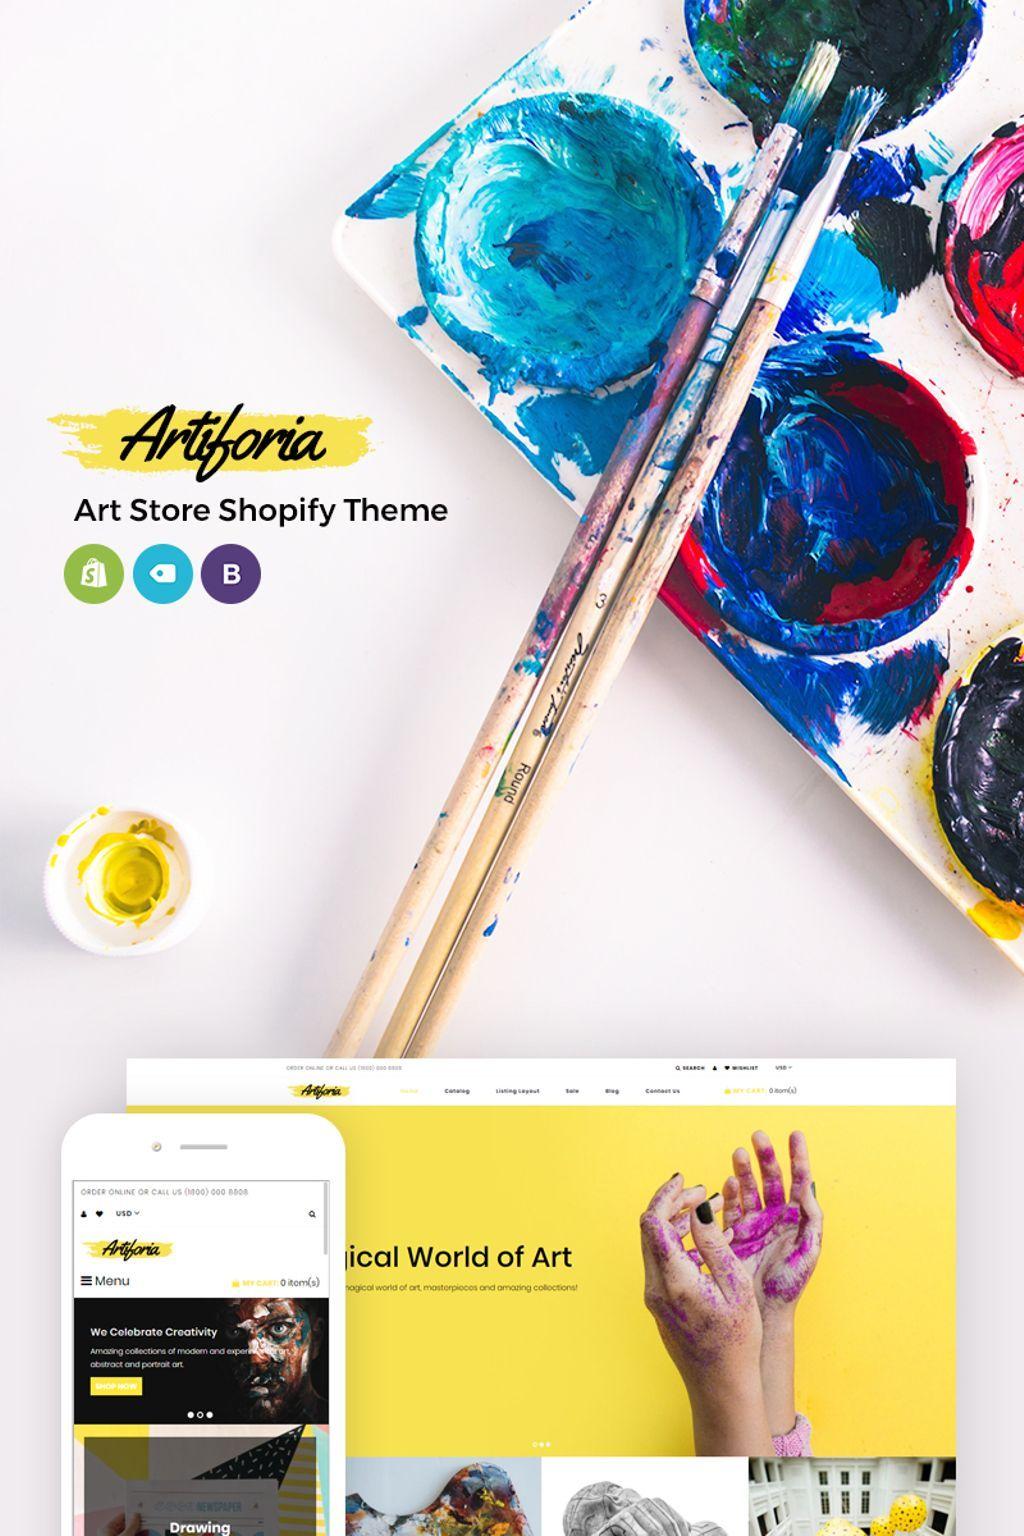 Artiforia art store shopify theme